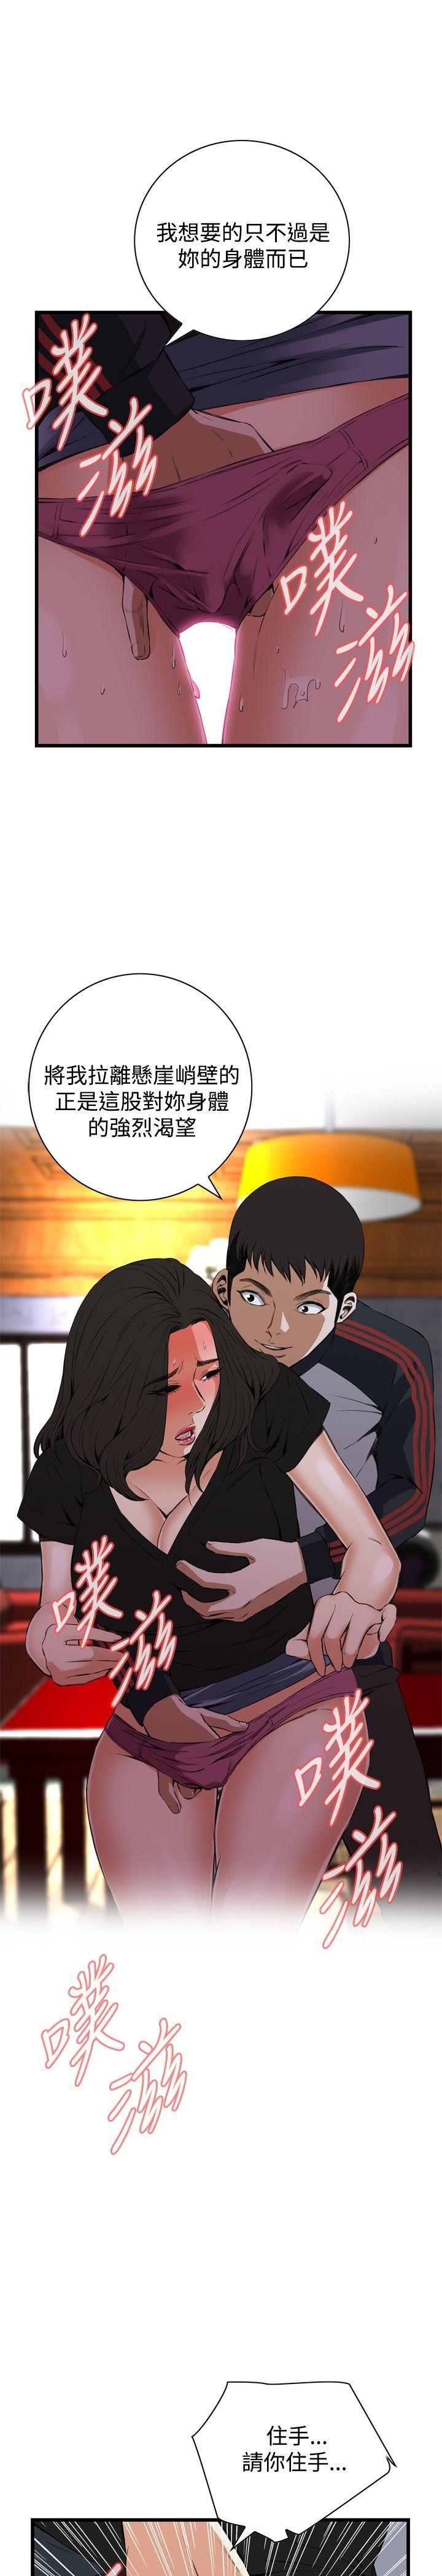 Take a Peek 偷窥 Ch.39~60 [Chinese]中文 569